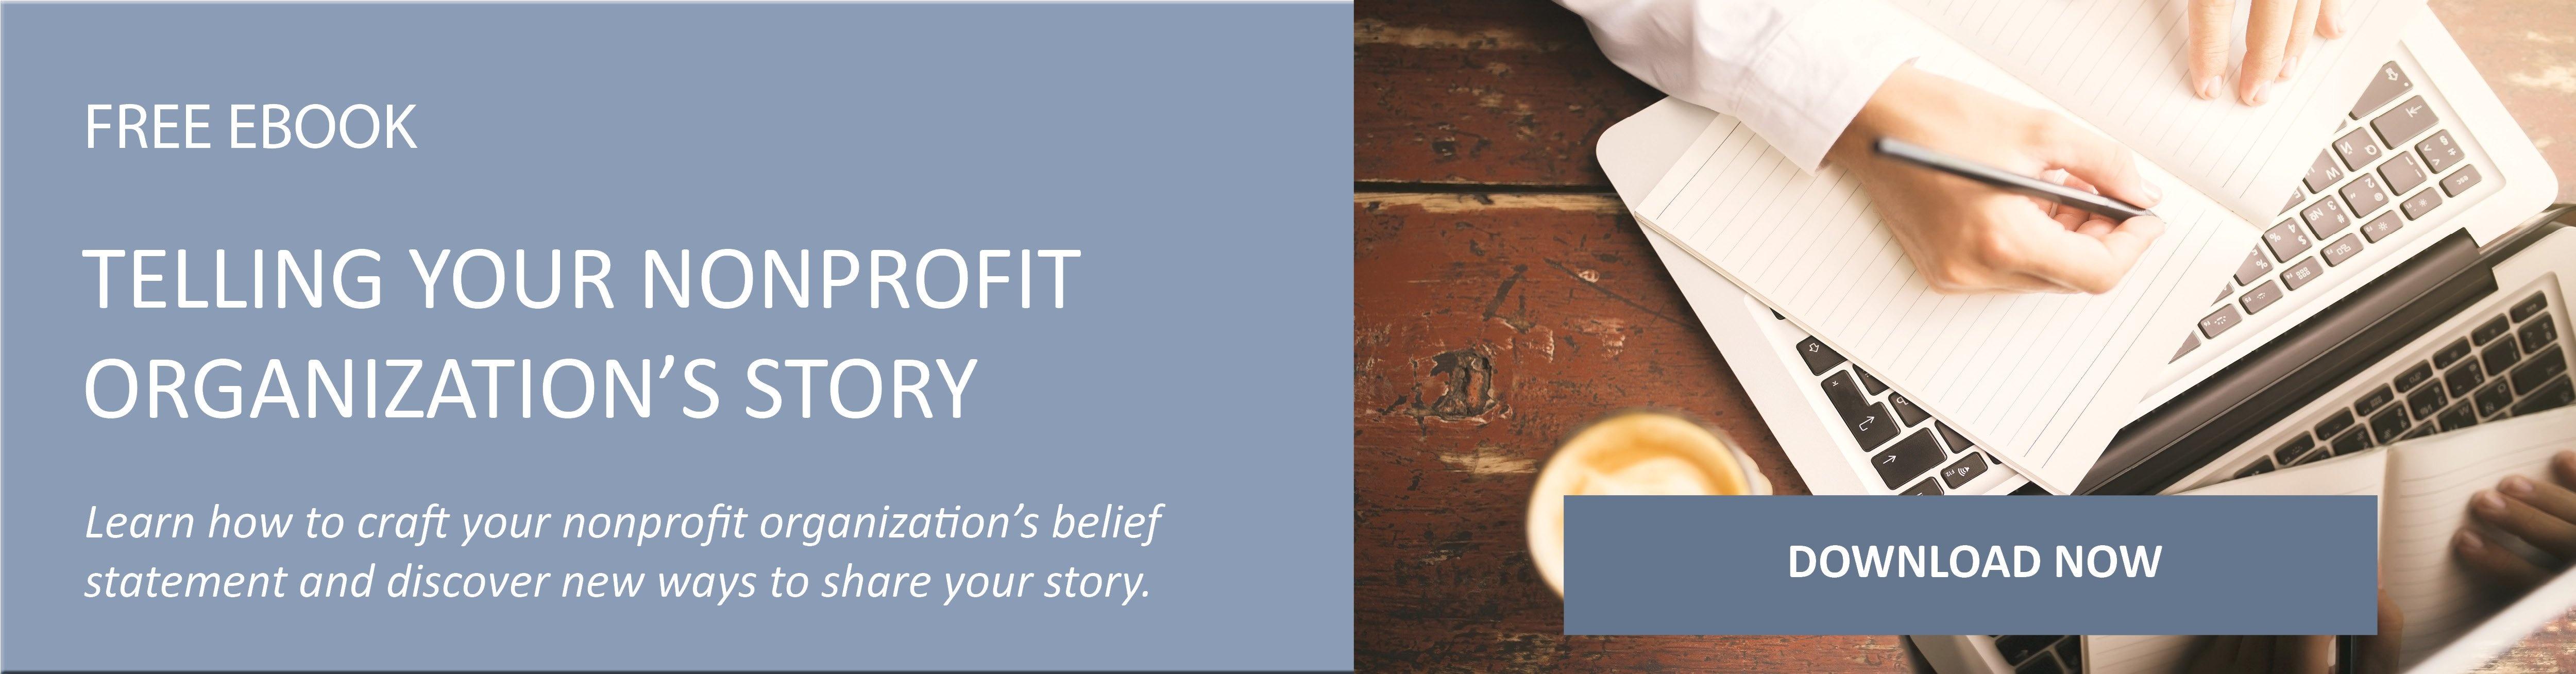 CTA-telling-nonprofit-story